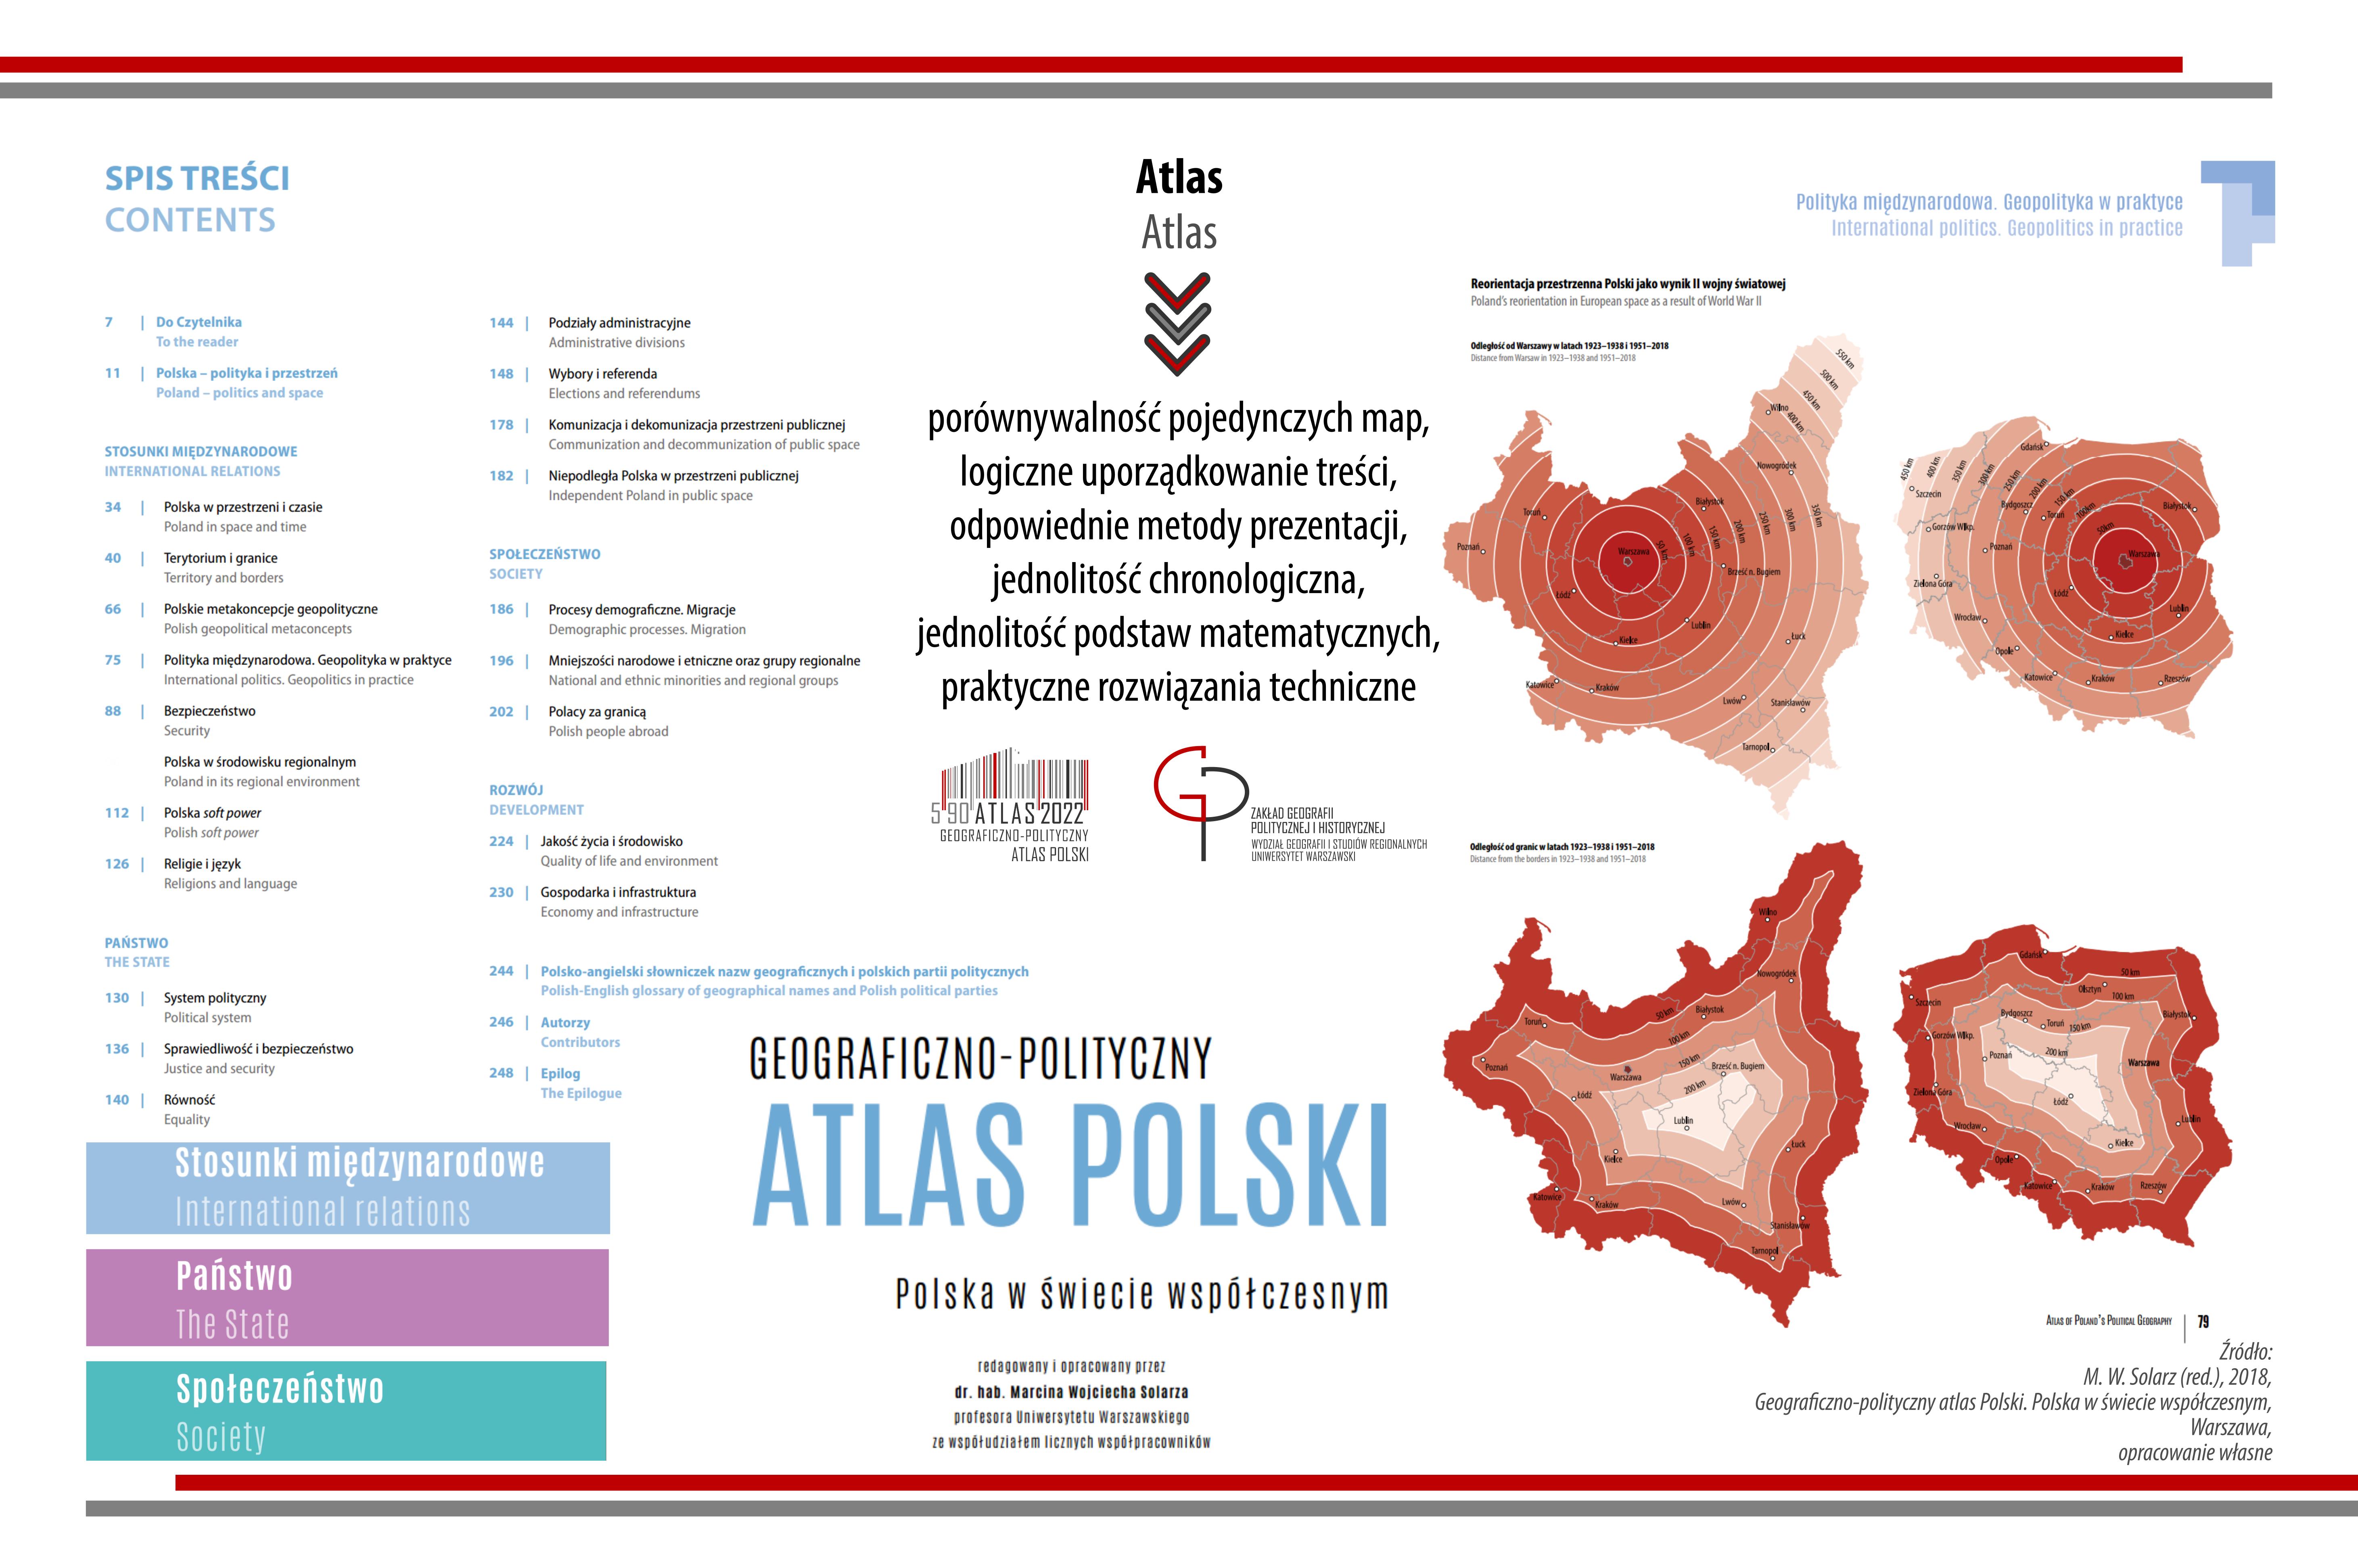 POST KARTOGRAFICZNY: atlasy